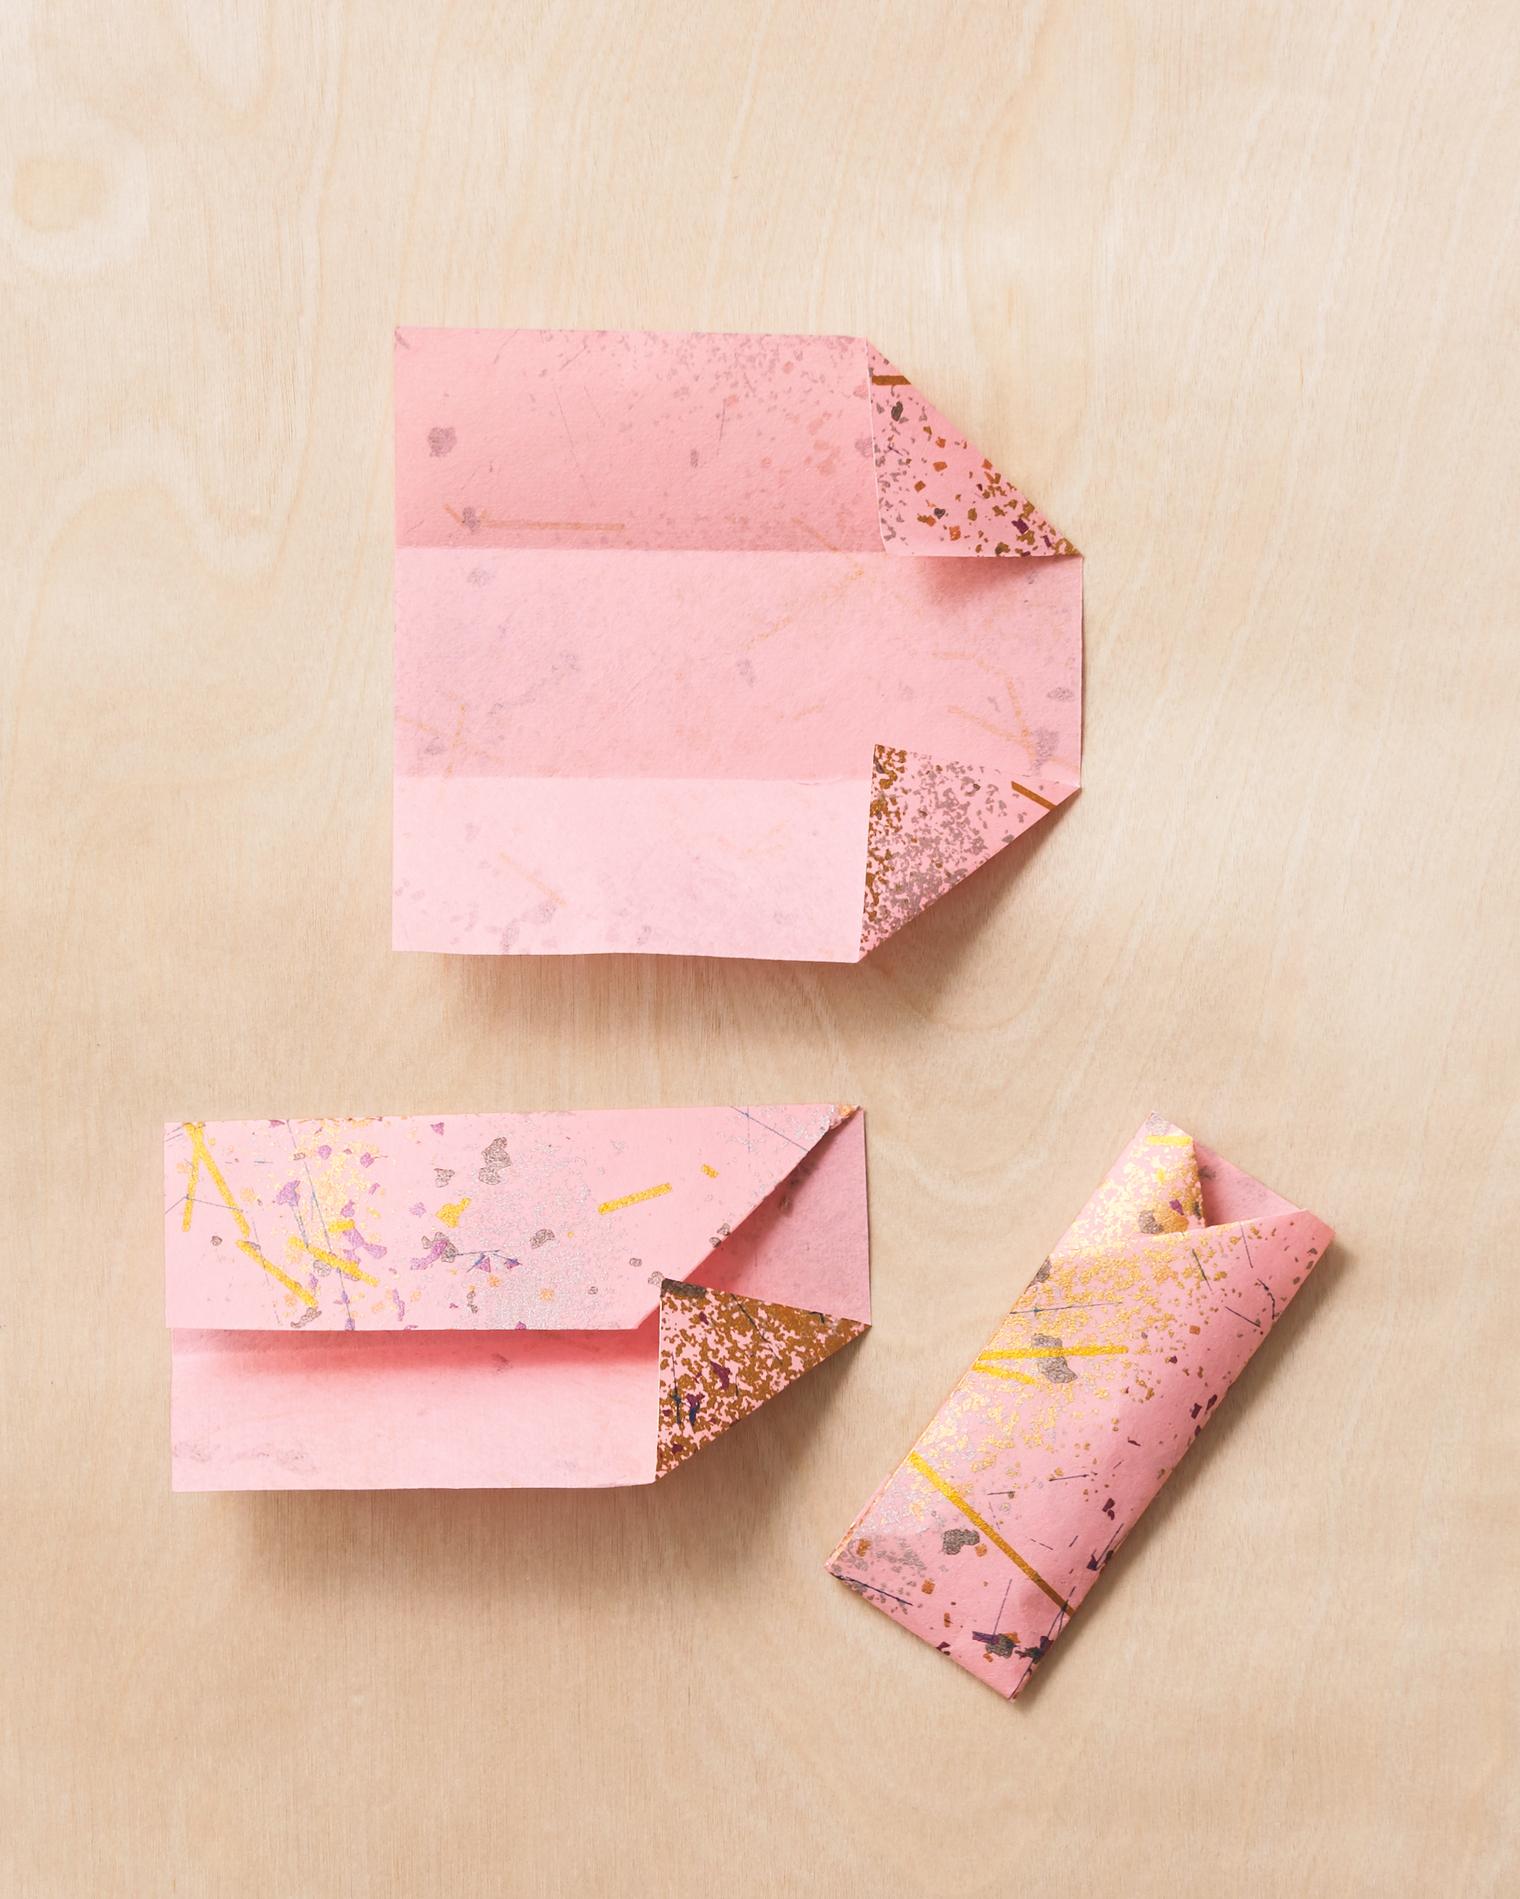 origami-171-mwd110795.jpg